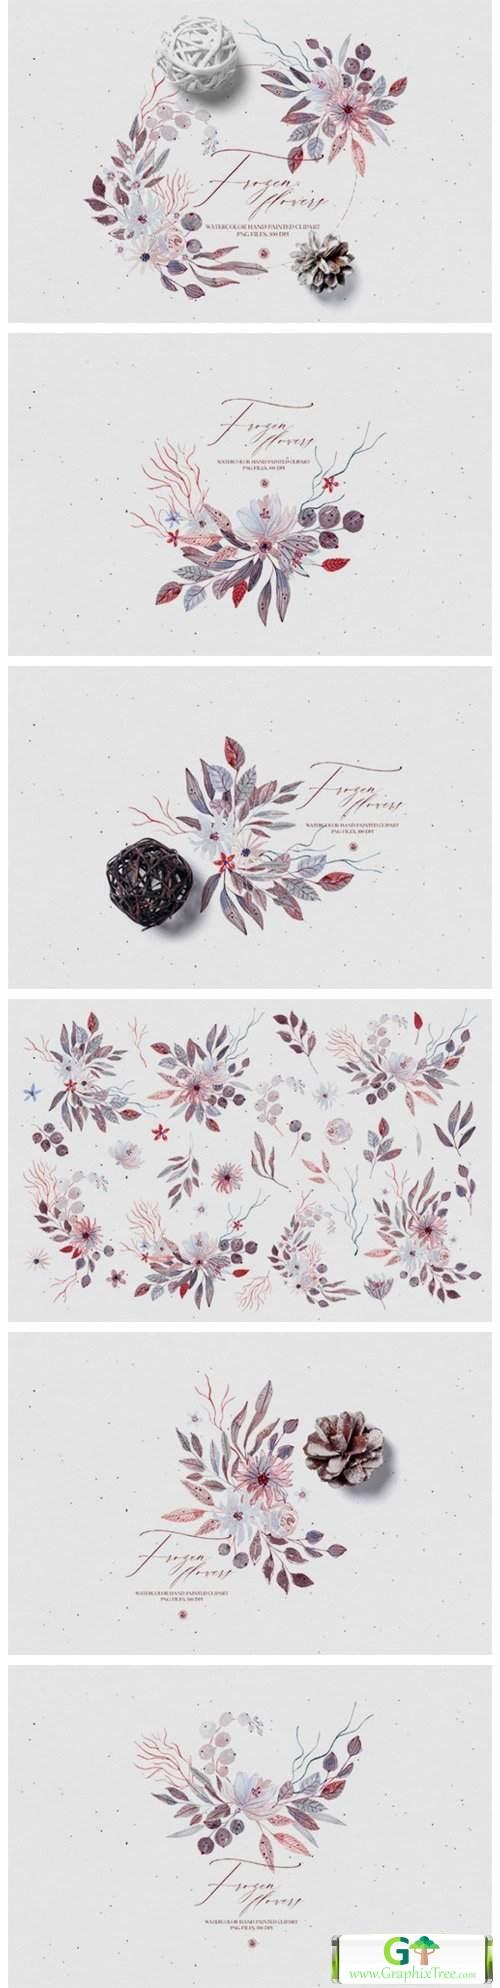 Watercolor Floral Set - Frozen Flowers [Stock Image] [illustrations]